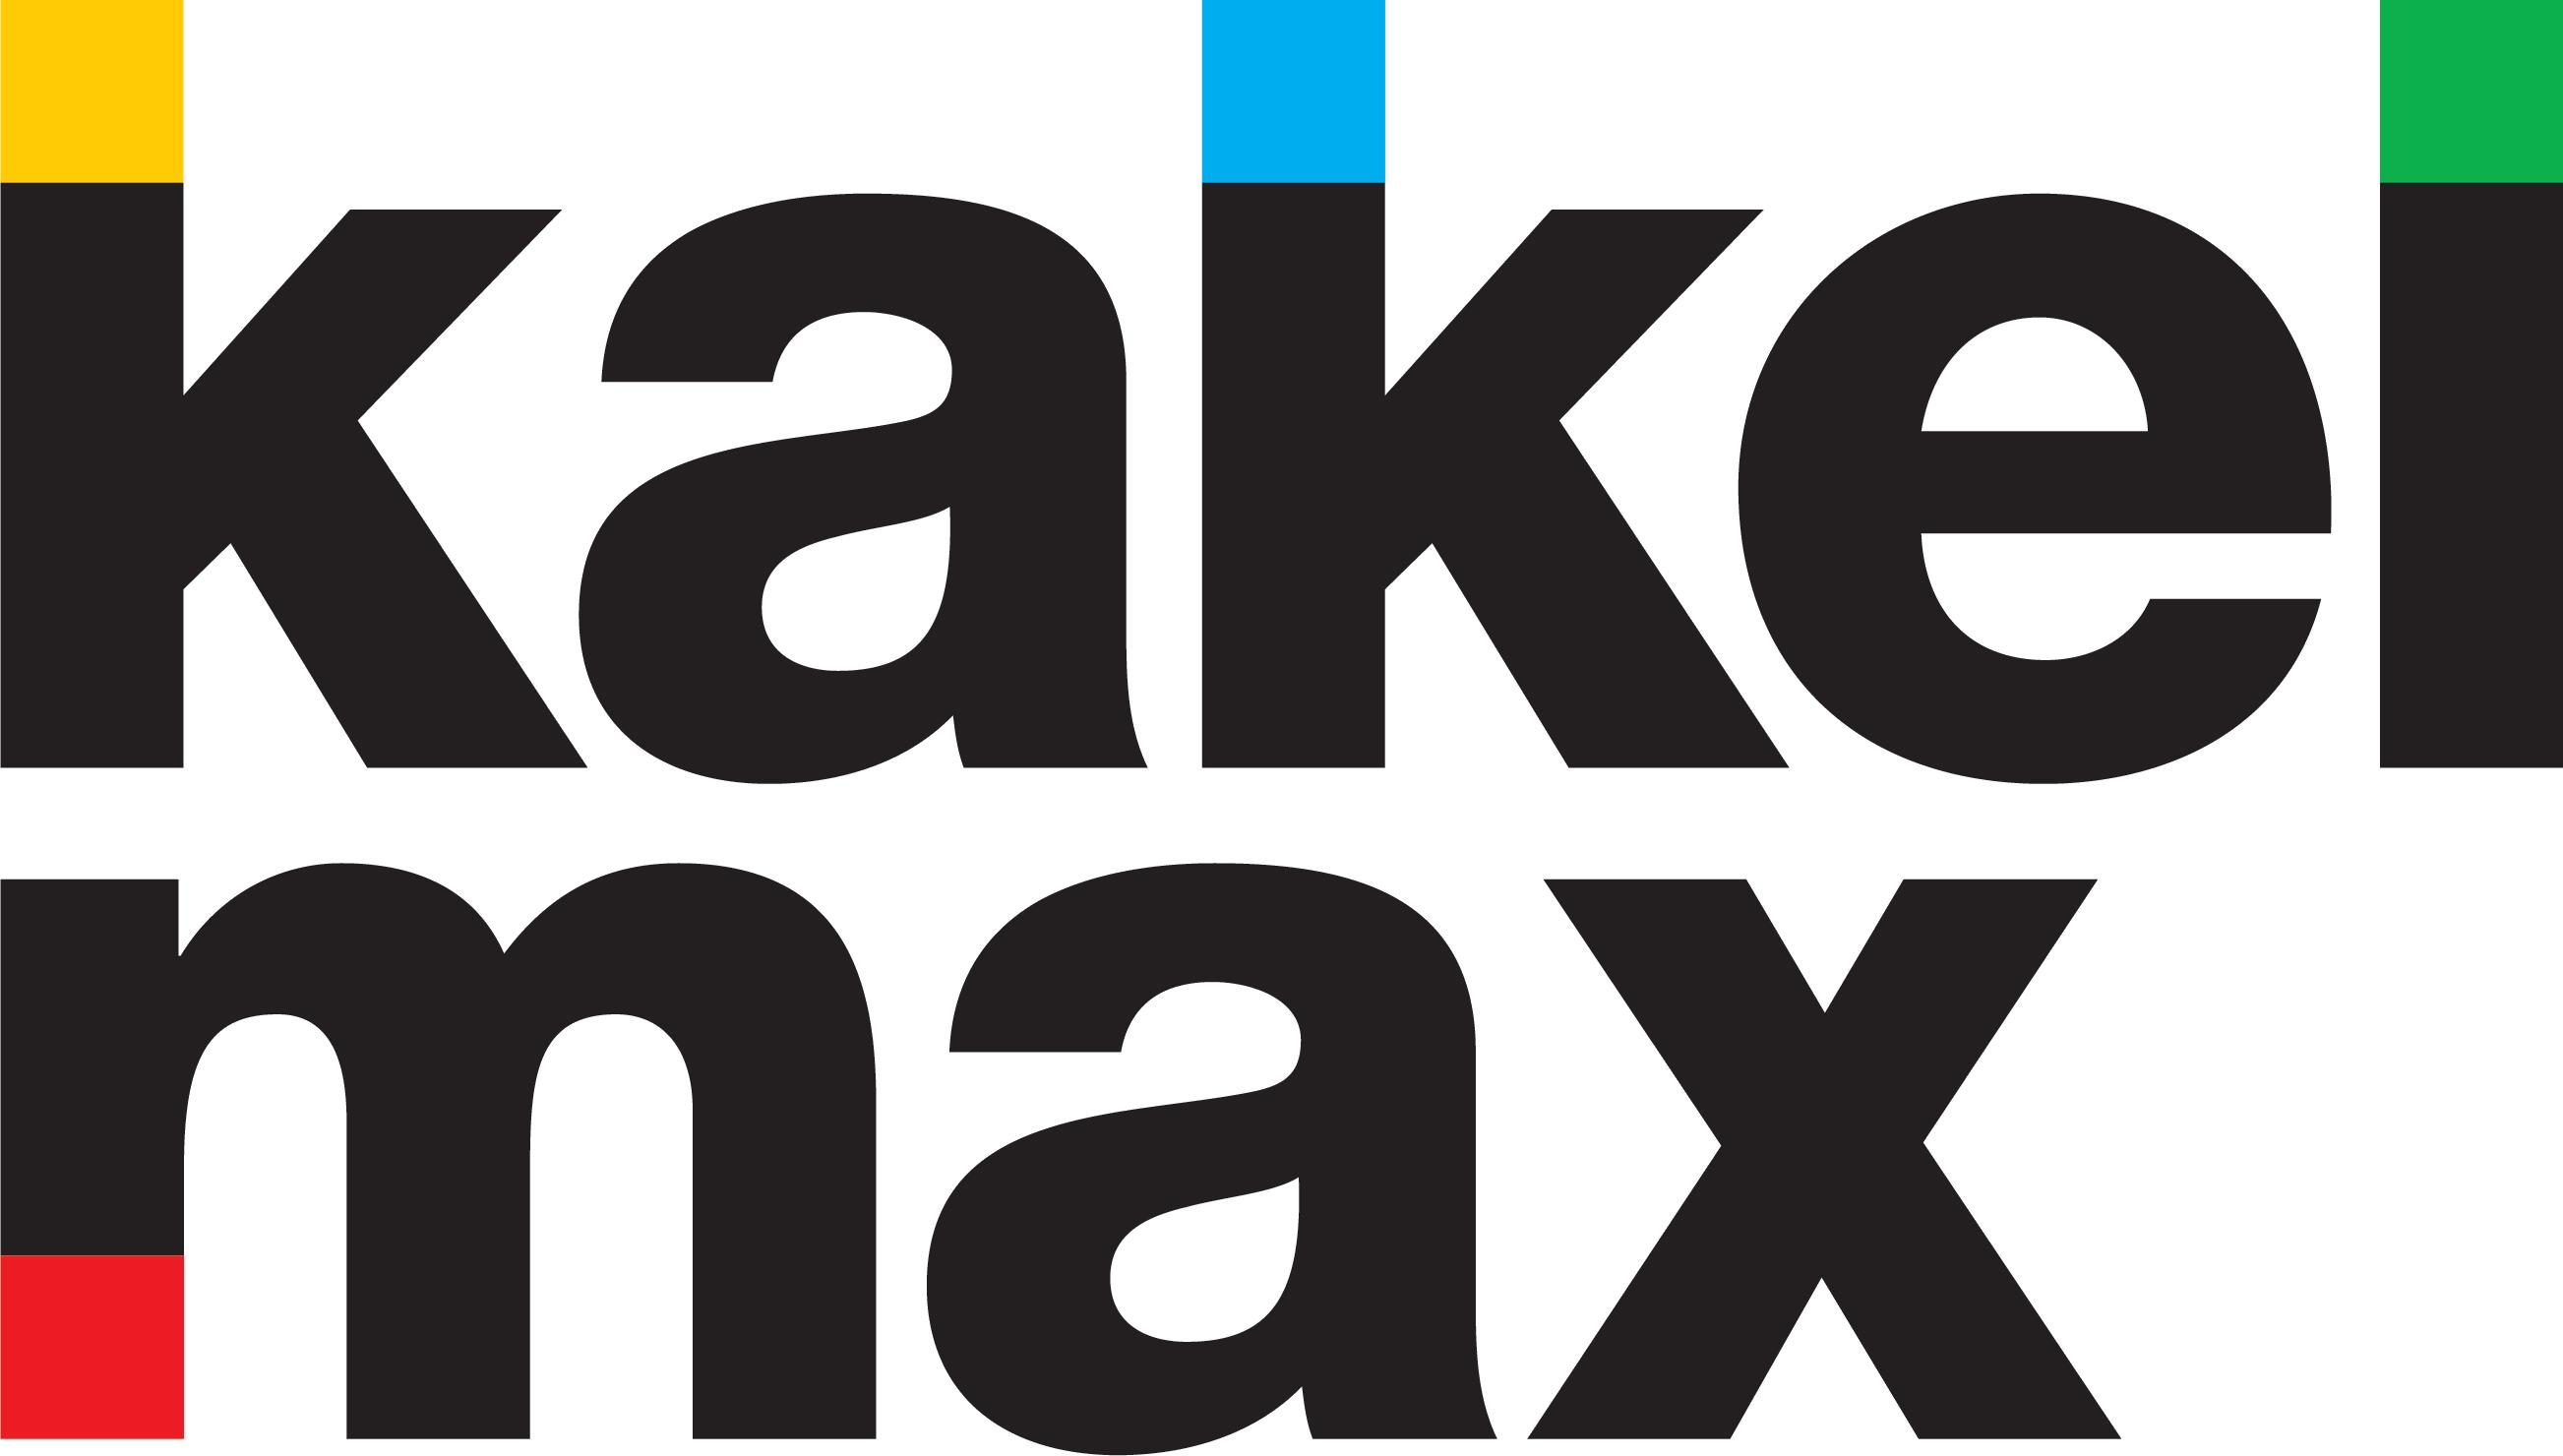 Kakelmax logo